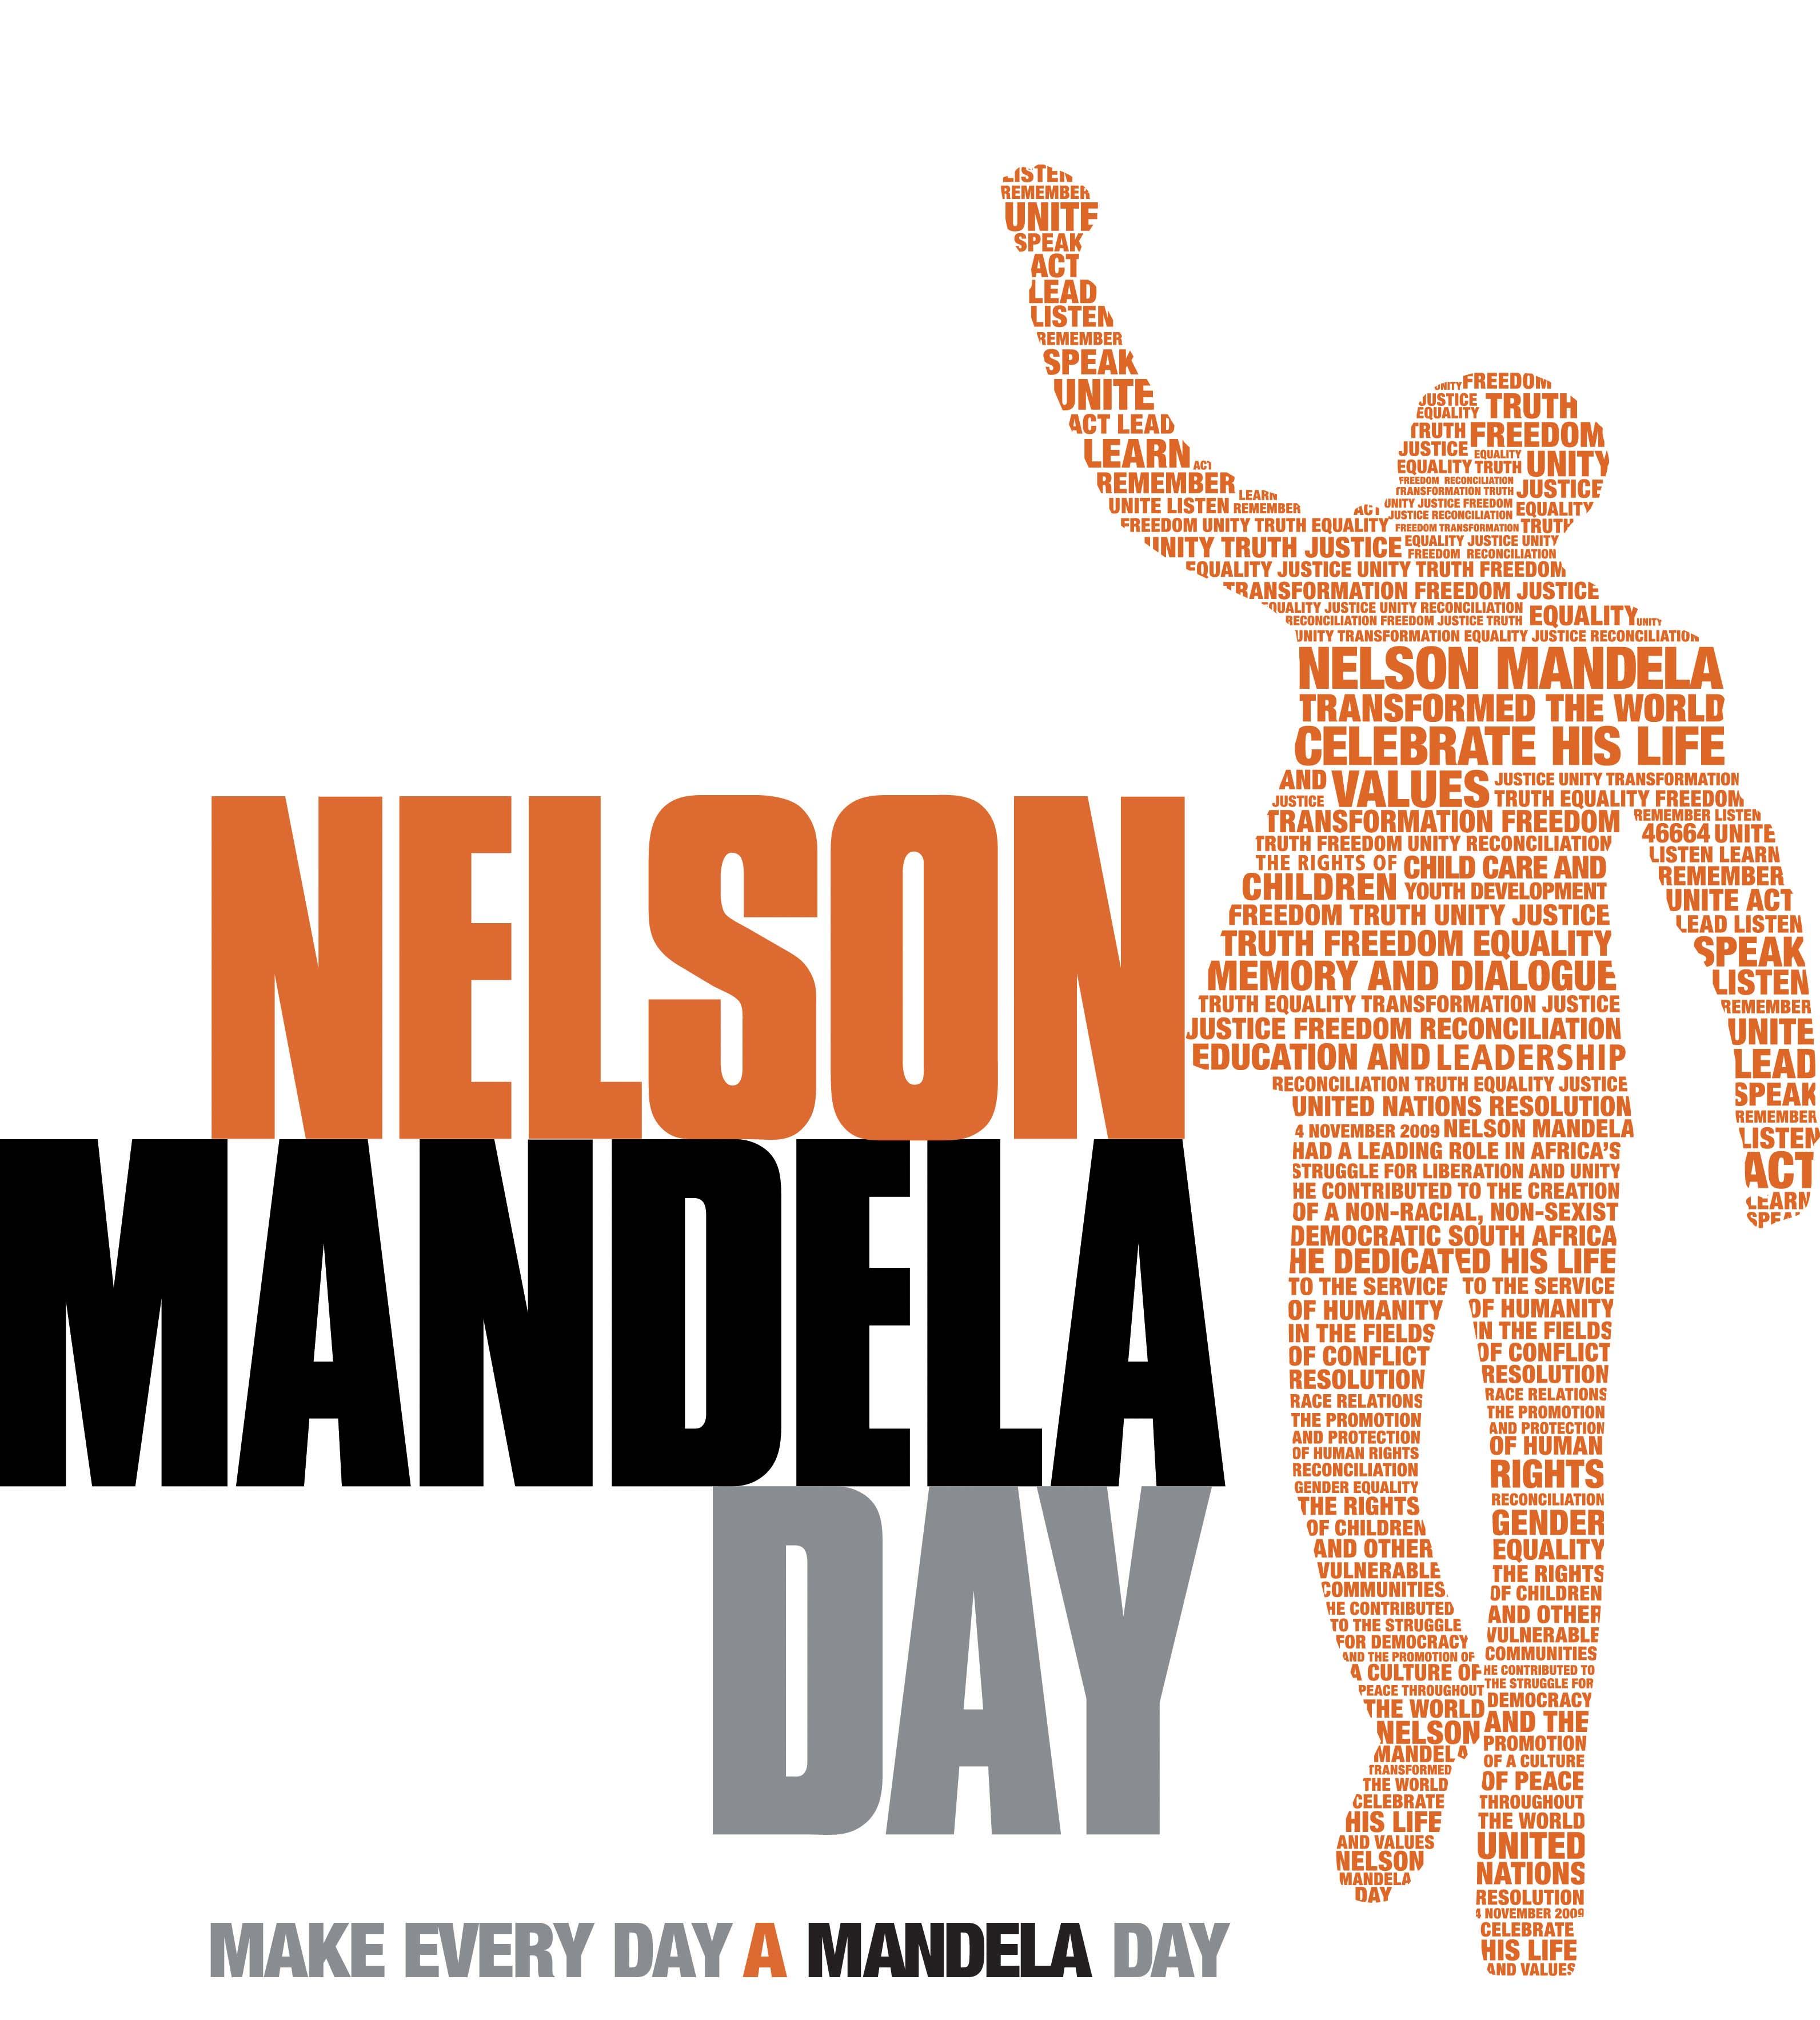 Nelson mandela international day annual date 18 july